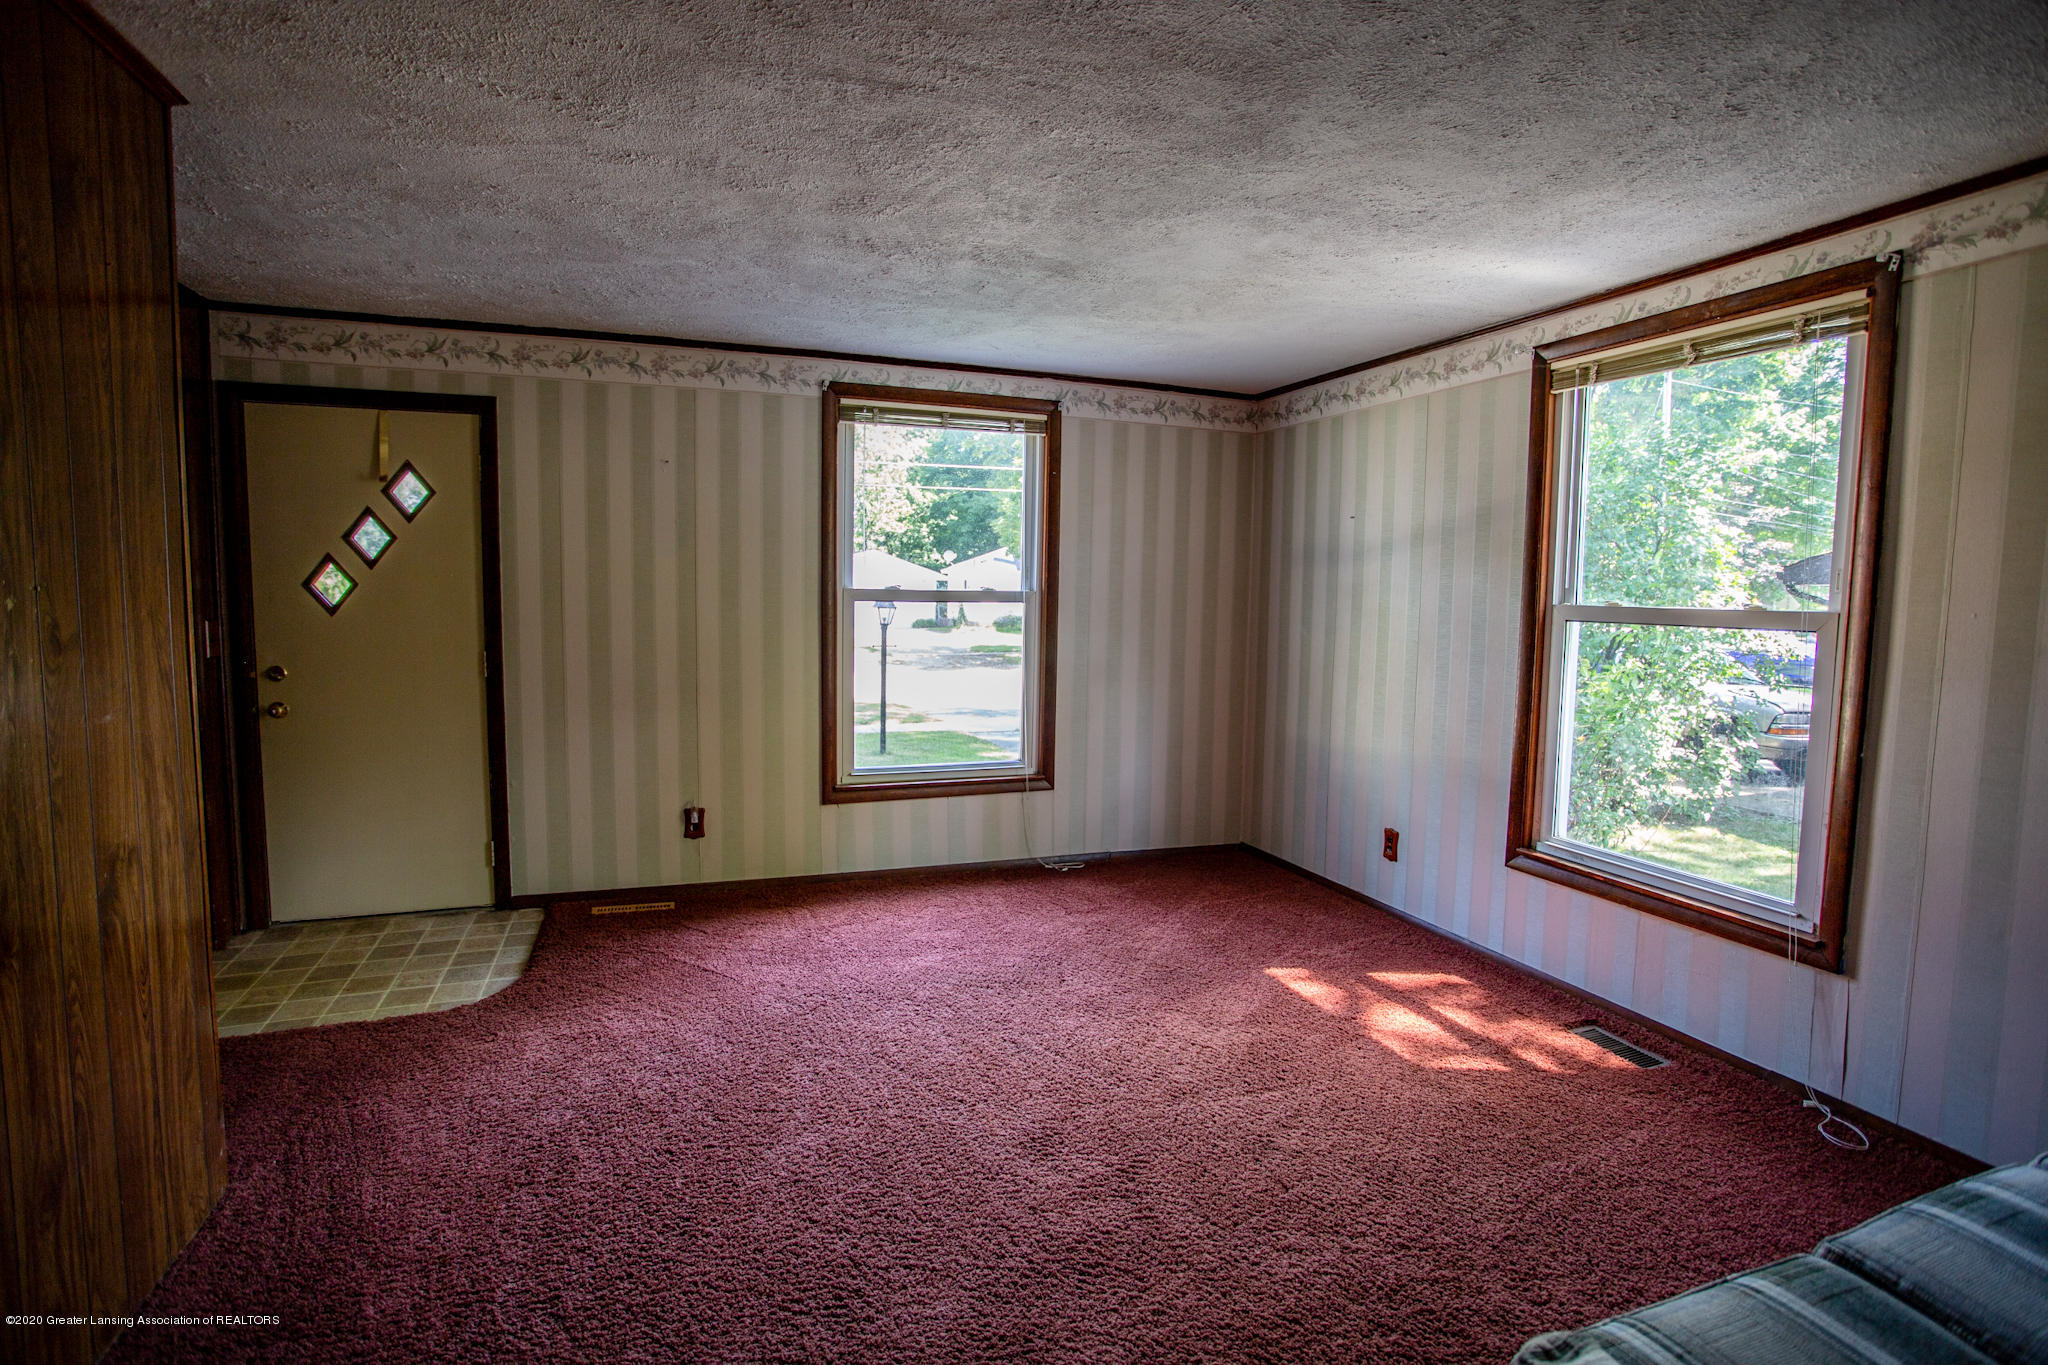 223 W Quincy St - 223 W. Quincy Living Room - 7